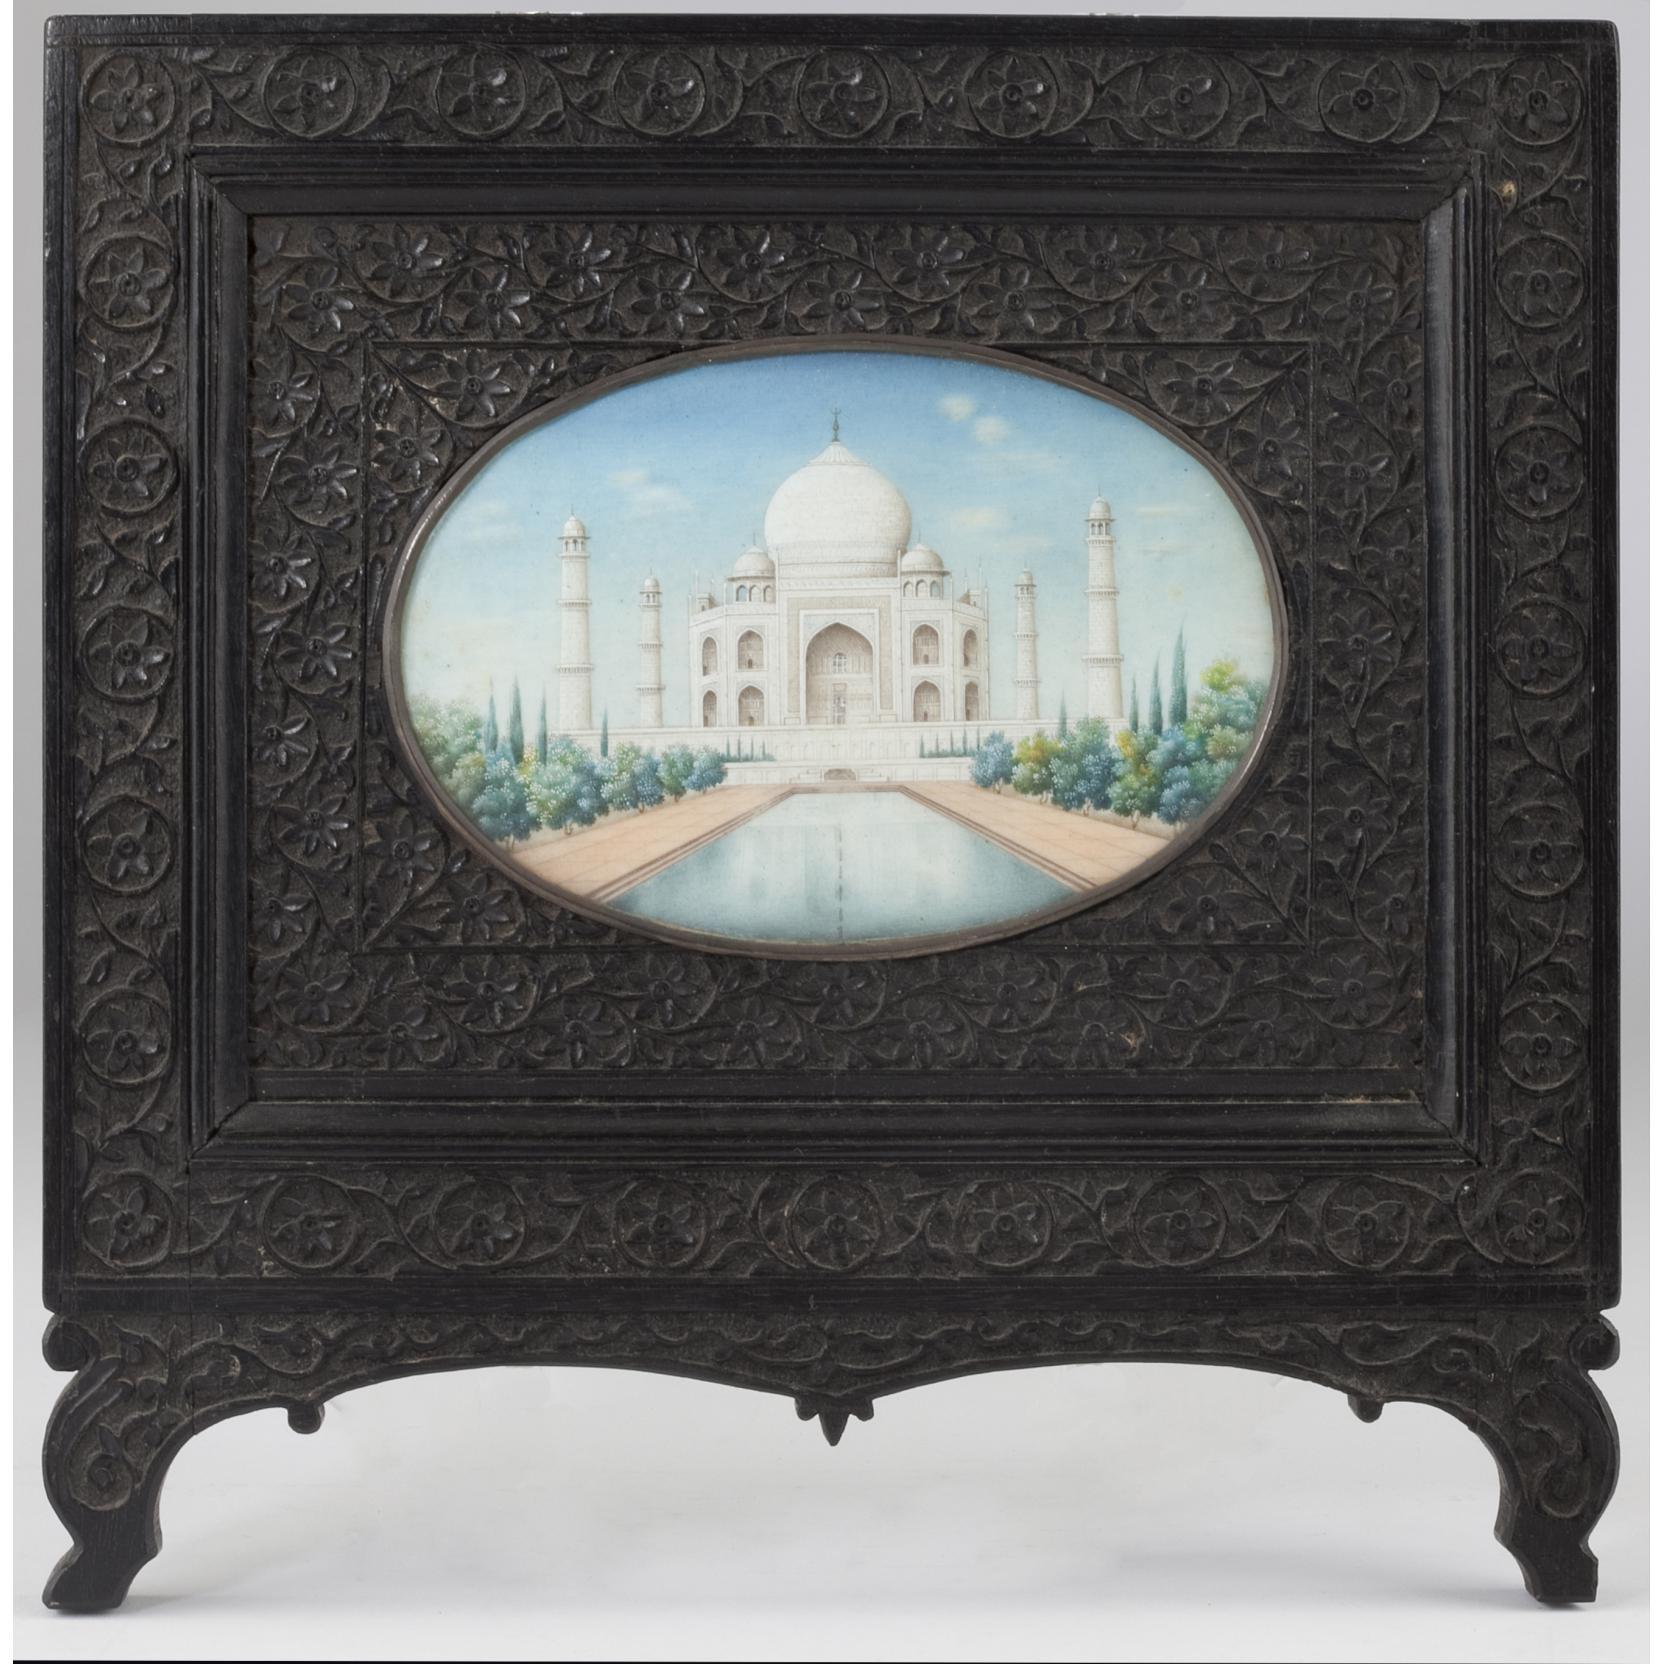 taj-mahal-company-school-miniature-india